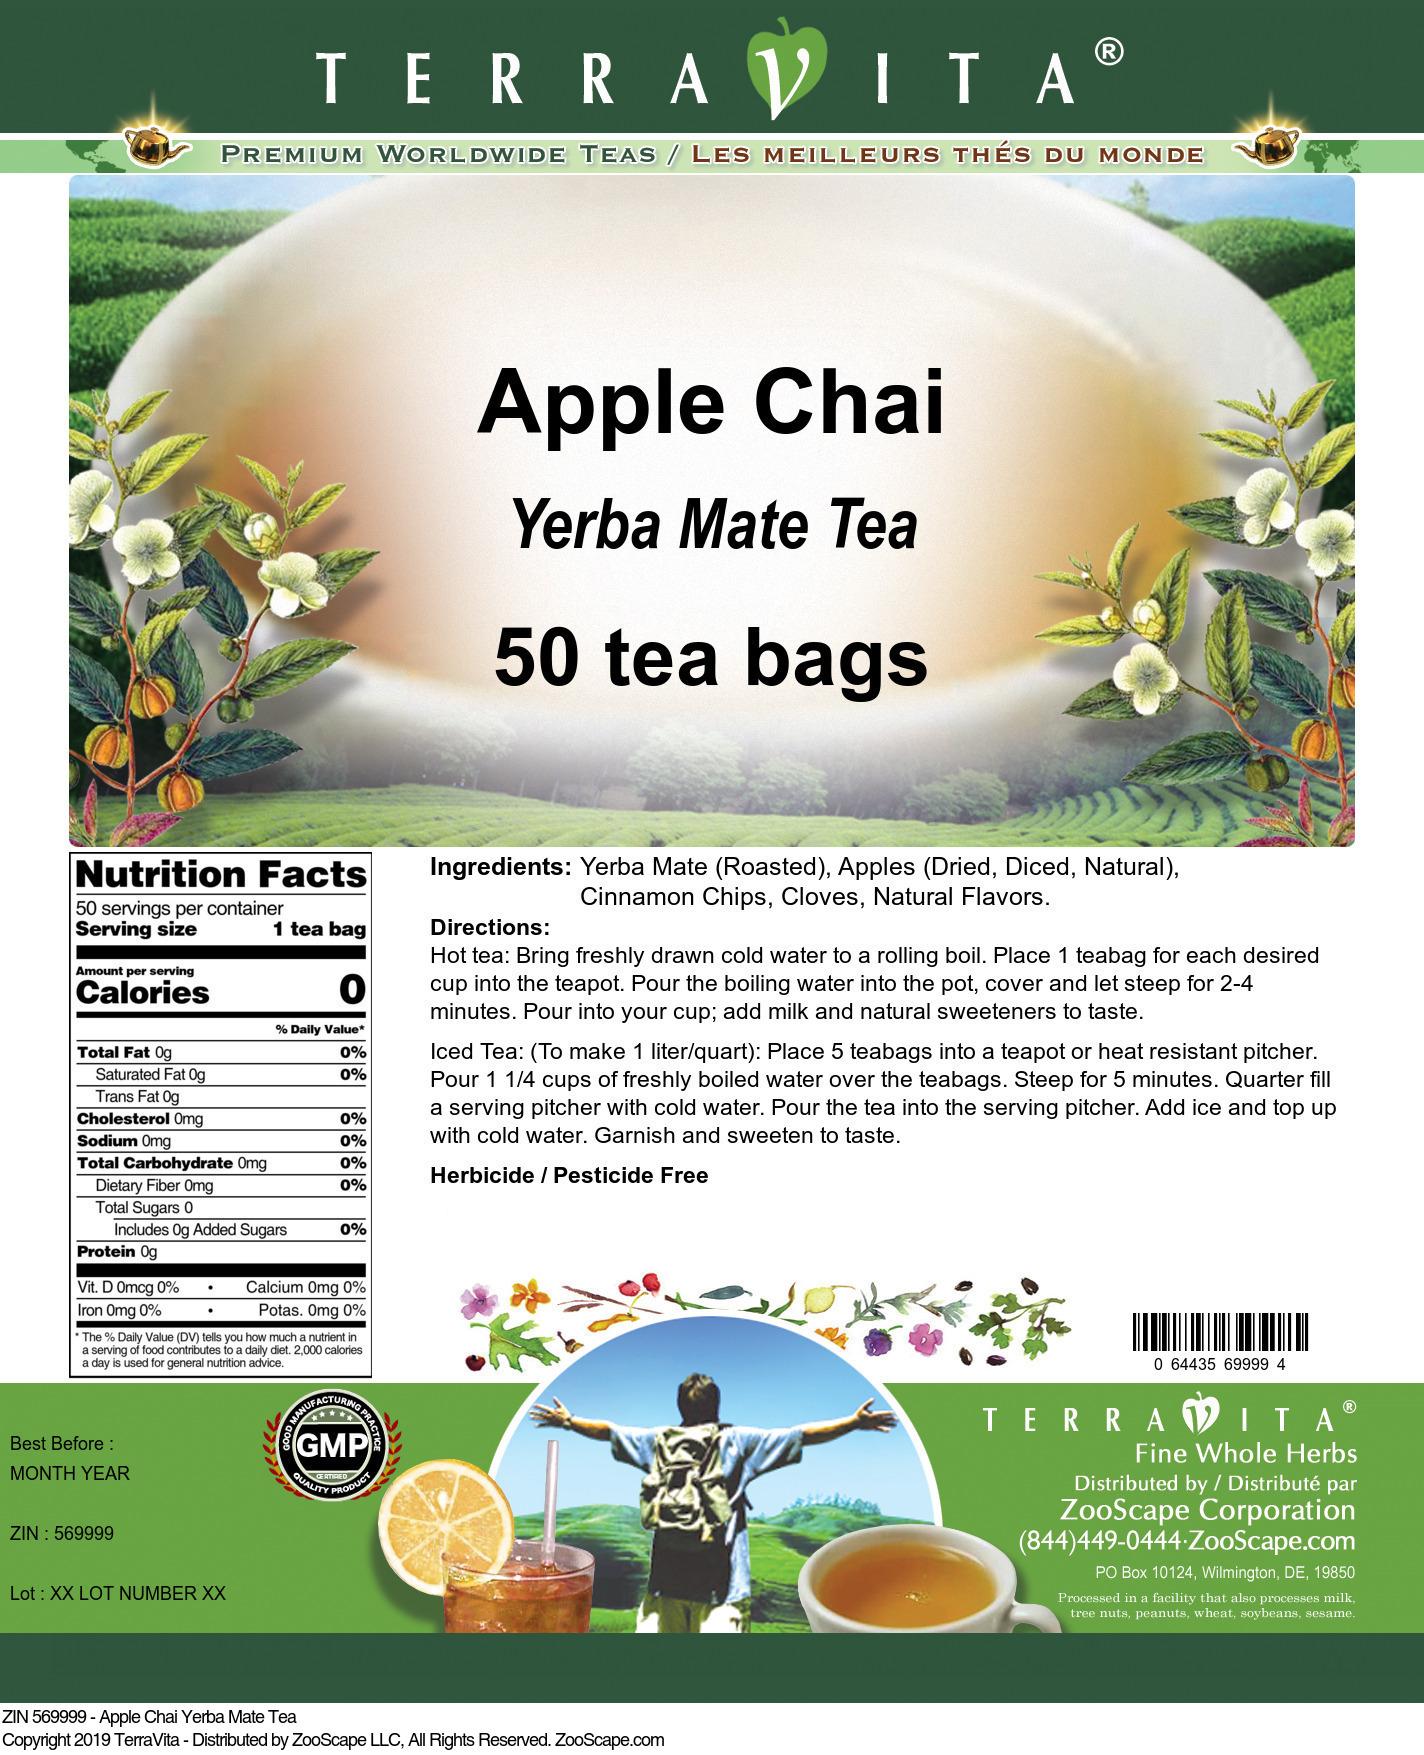 Apple Chai Yerba Mate